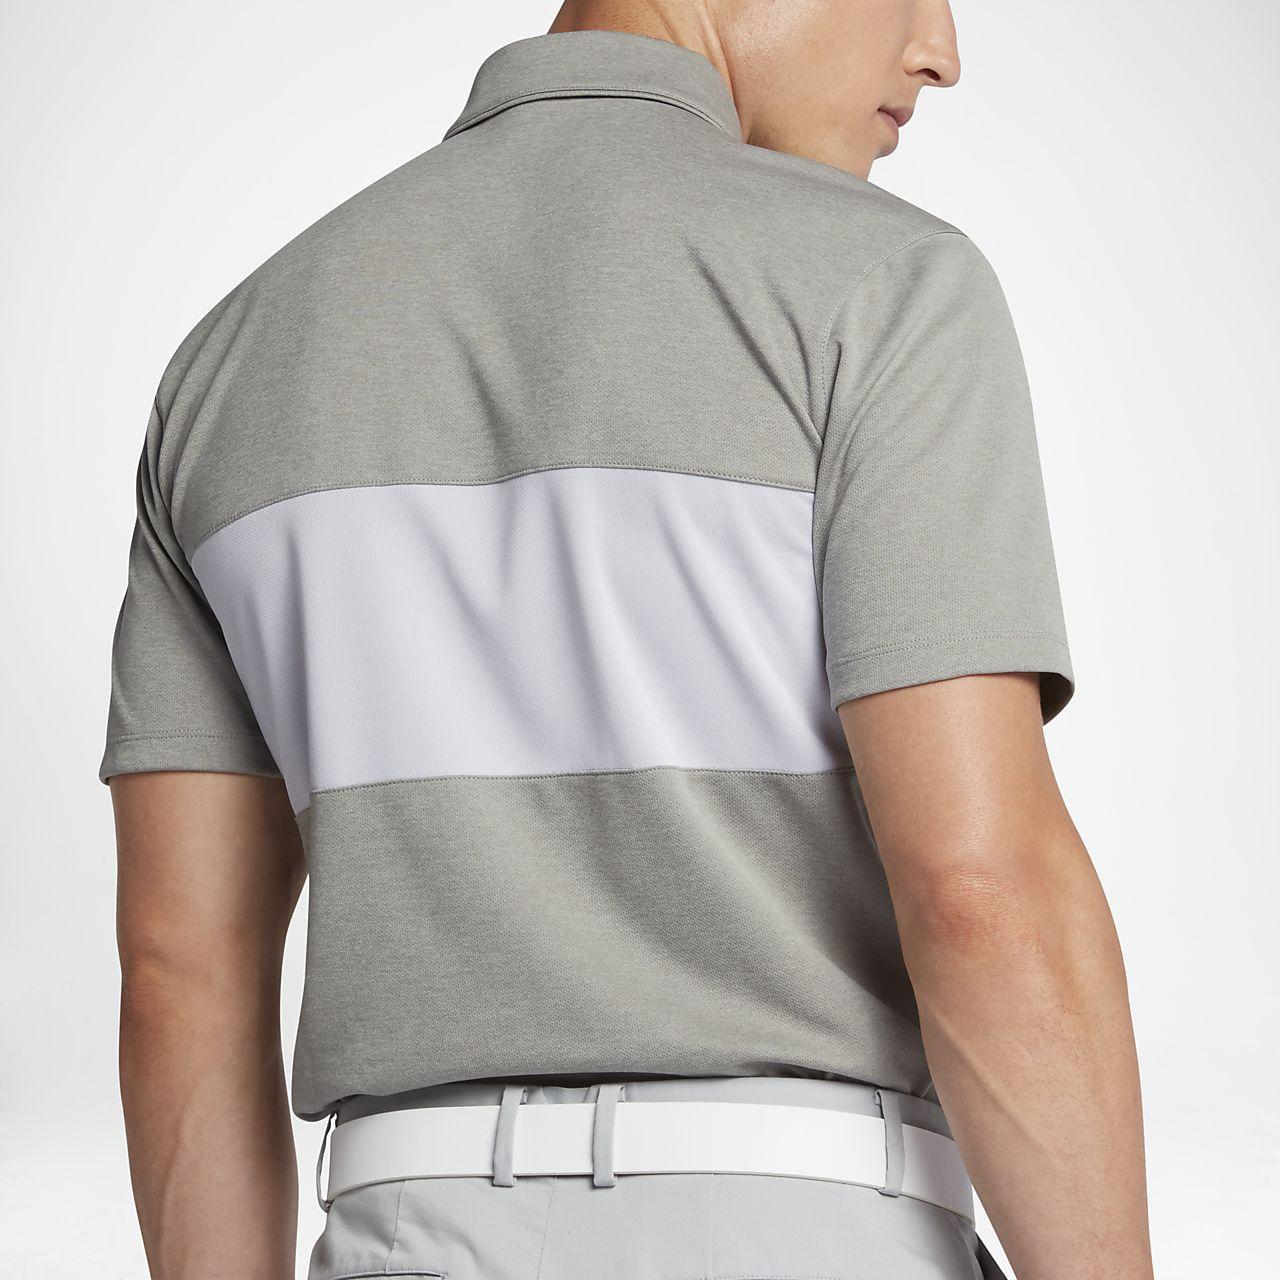 02c0c77f Nike Golf Mens Innovation Color Polo Shirt - DREAMWORKS